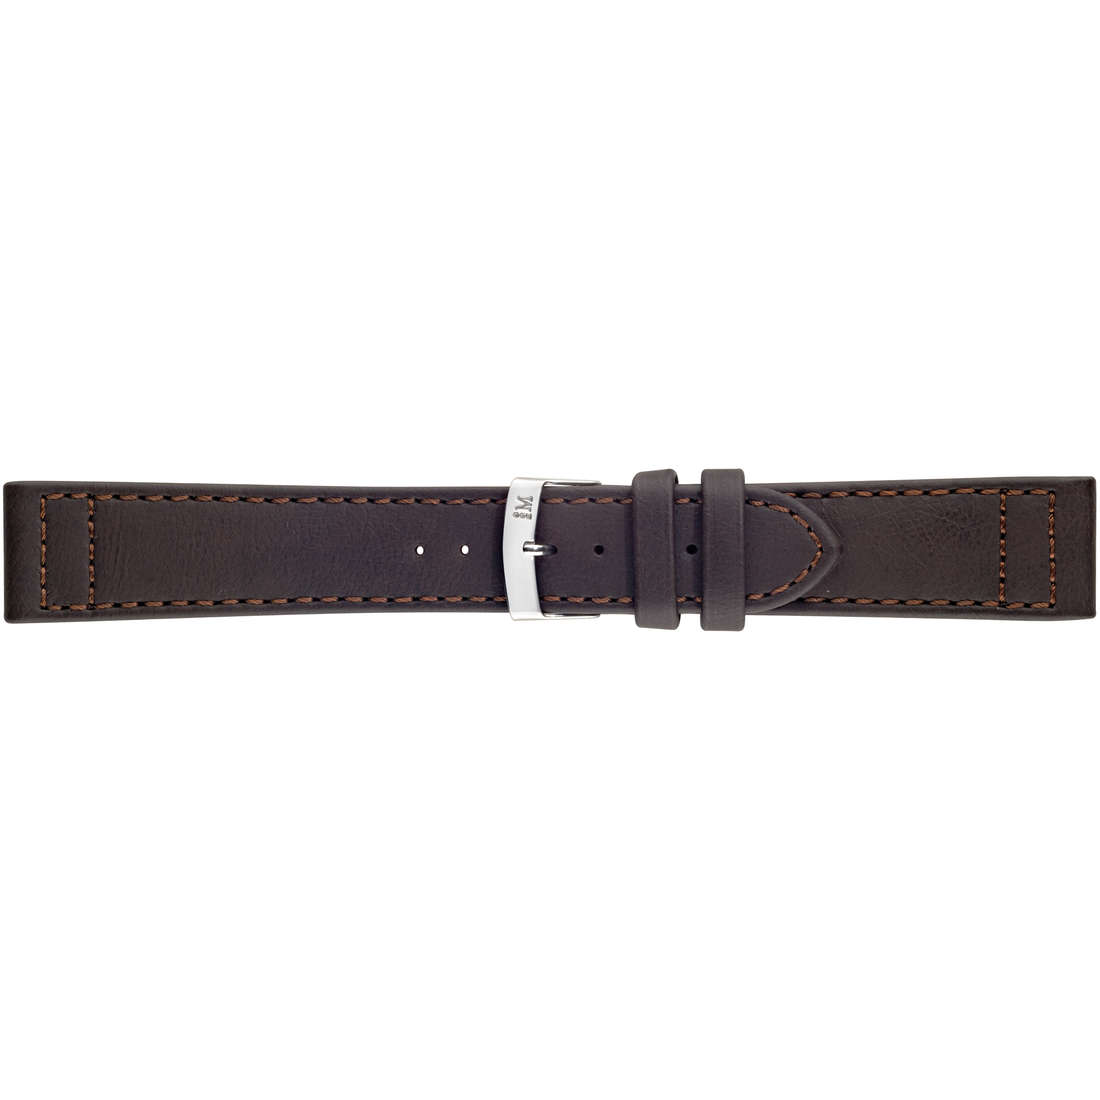 montre bracelet montre homme Morellato Green Collection A01X4472A39032CR22